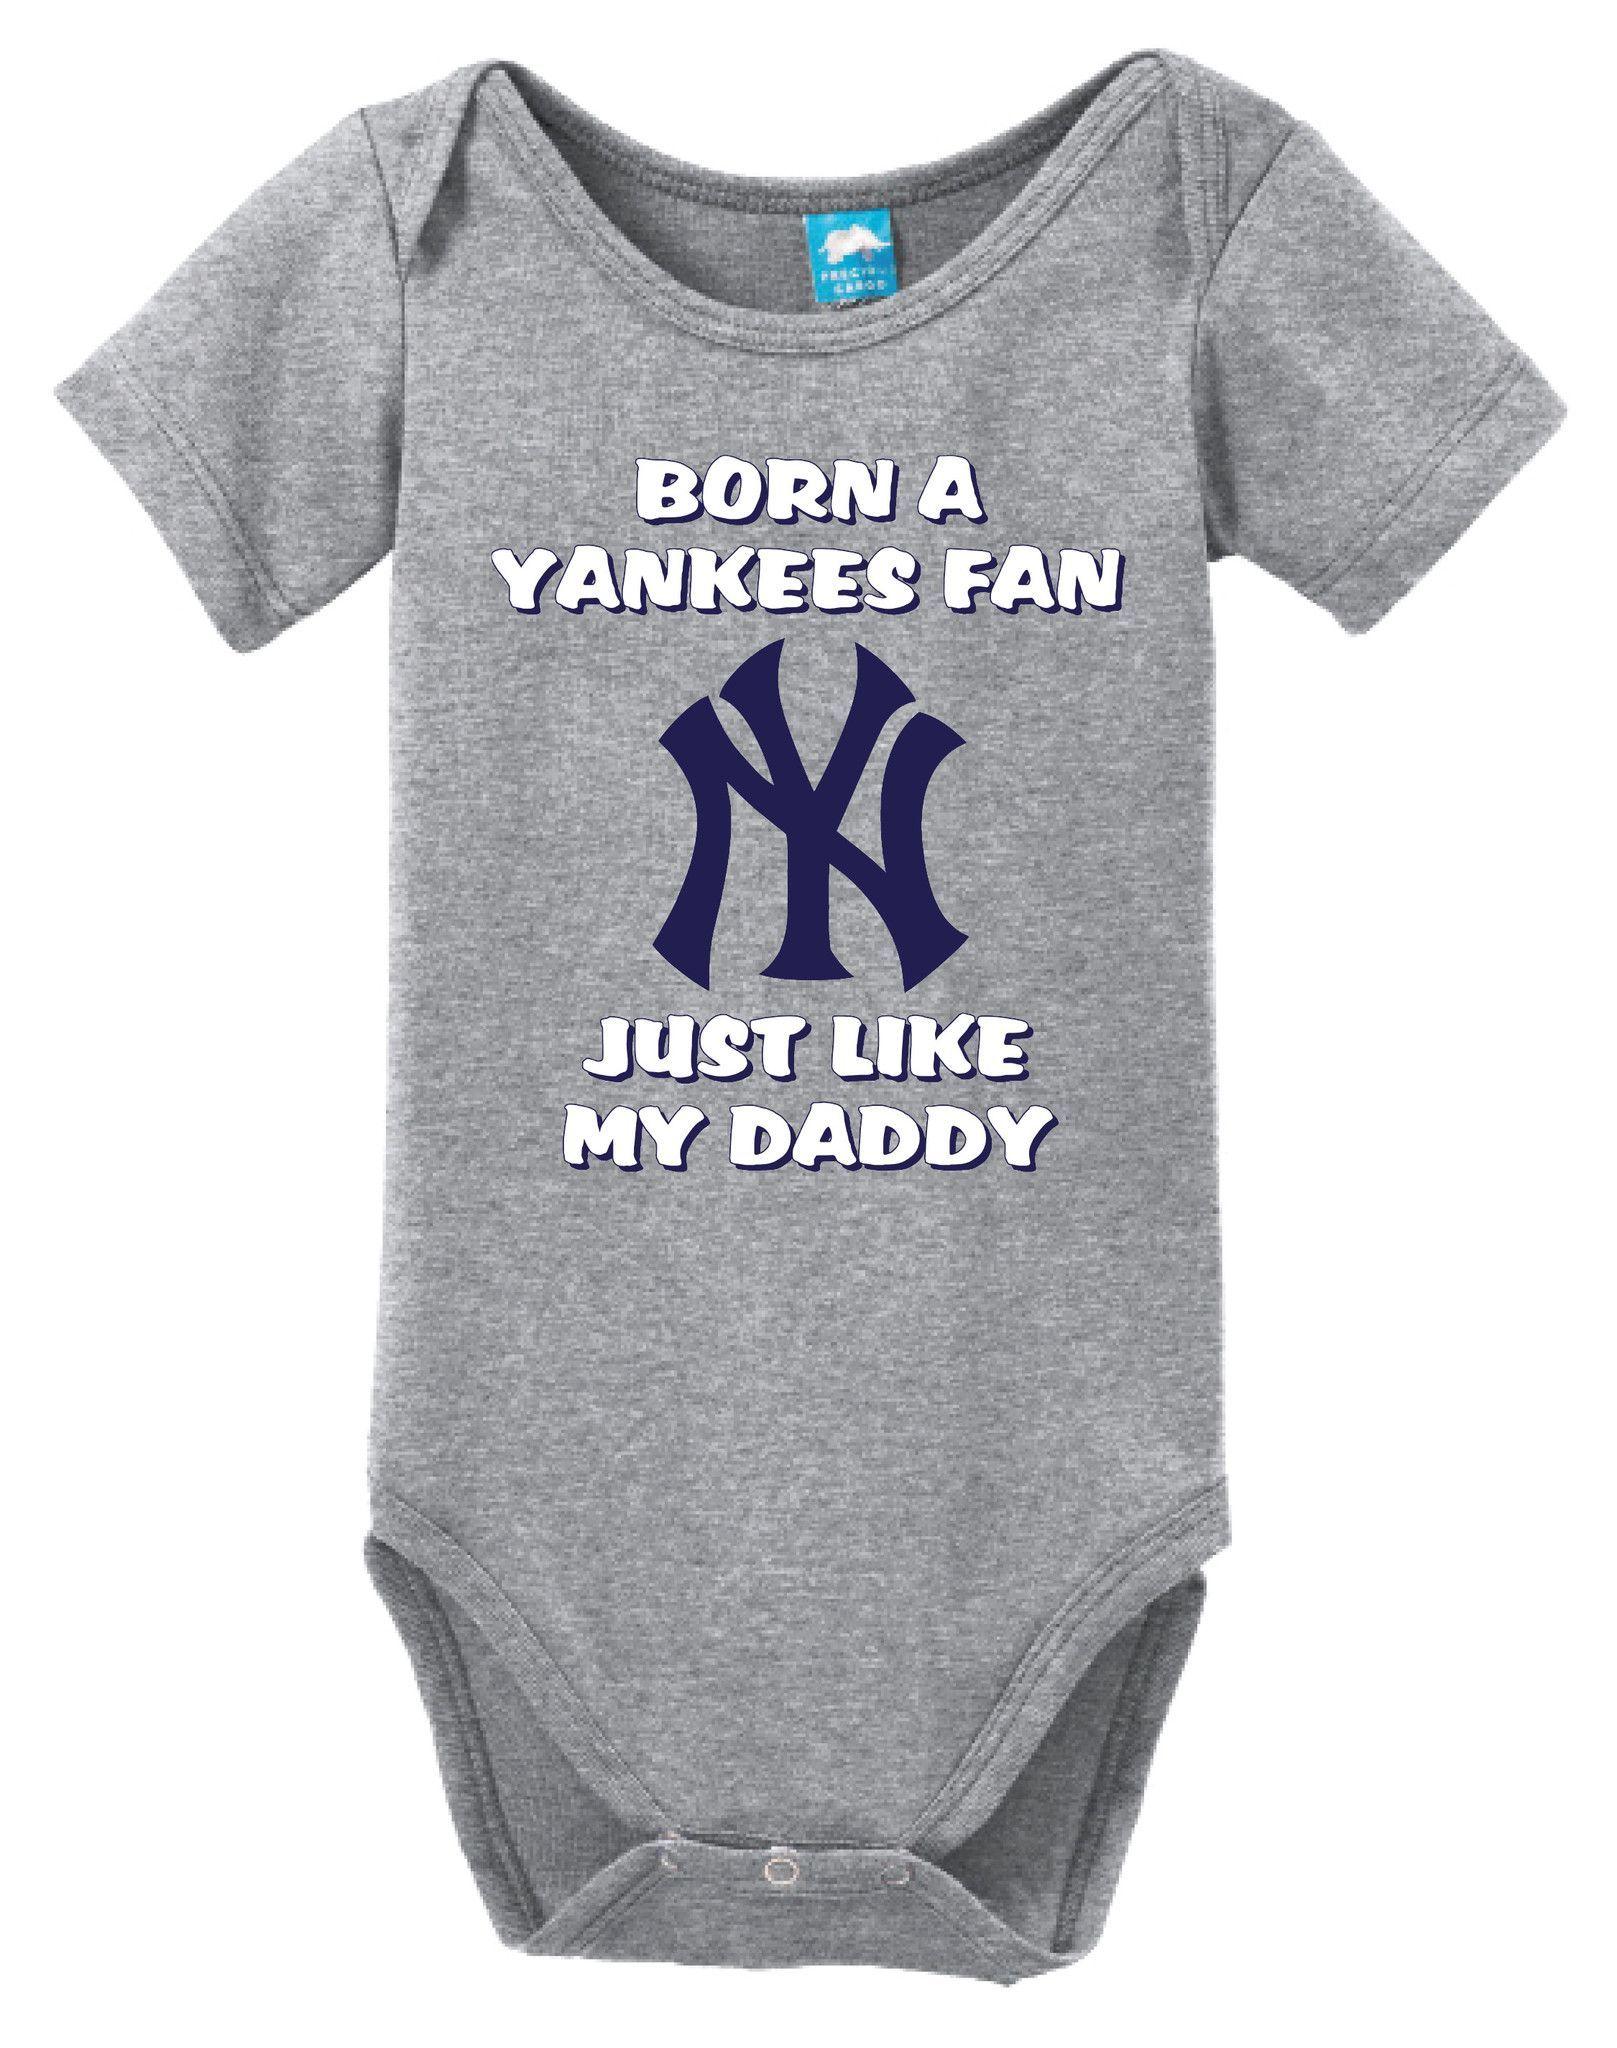 6d4d3d772bdb0 Born a Yankees Fan Just Like My Daddy